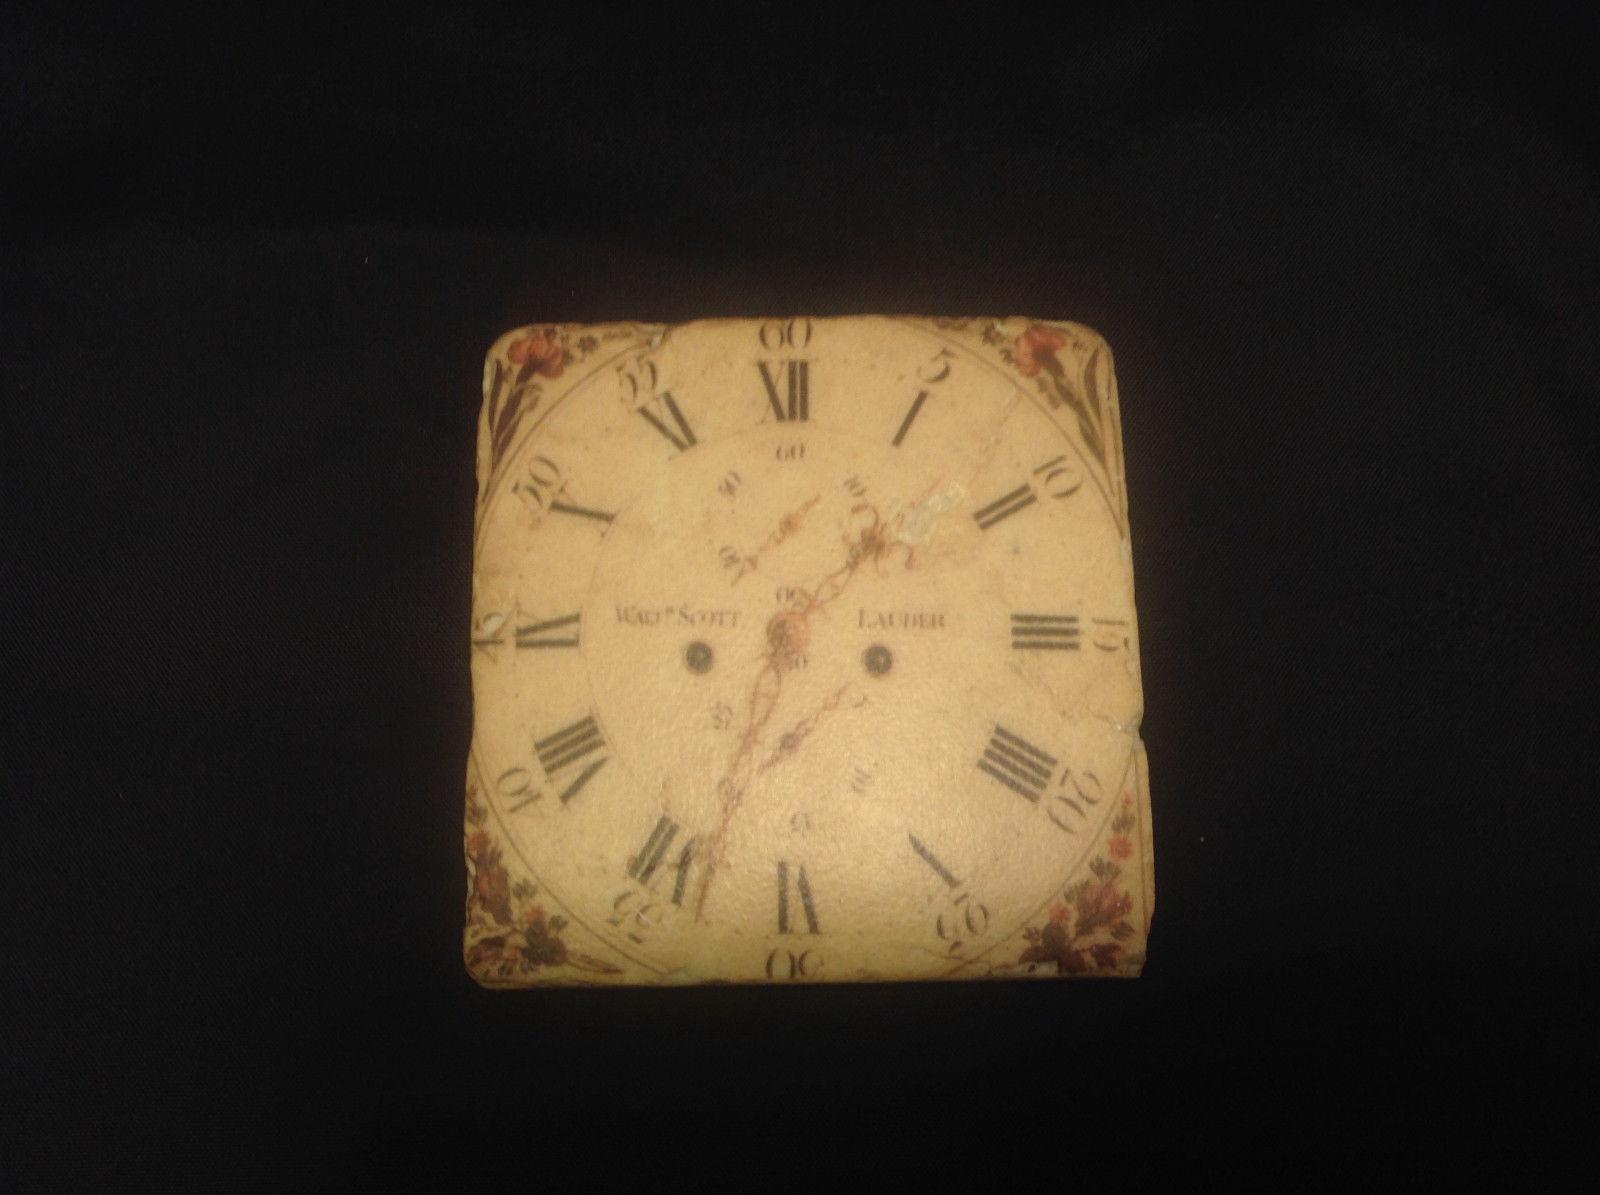 Ja Anderfon Wrst Haven Old World Clock Coaster Set of Four